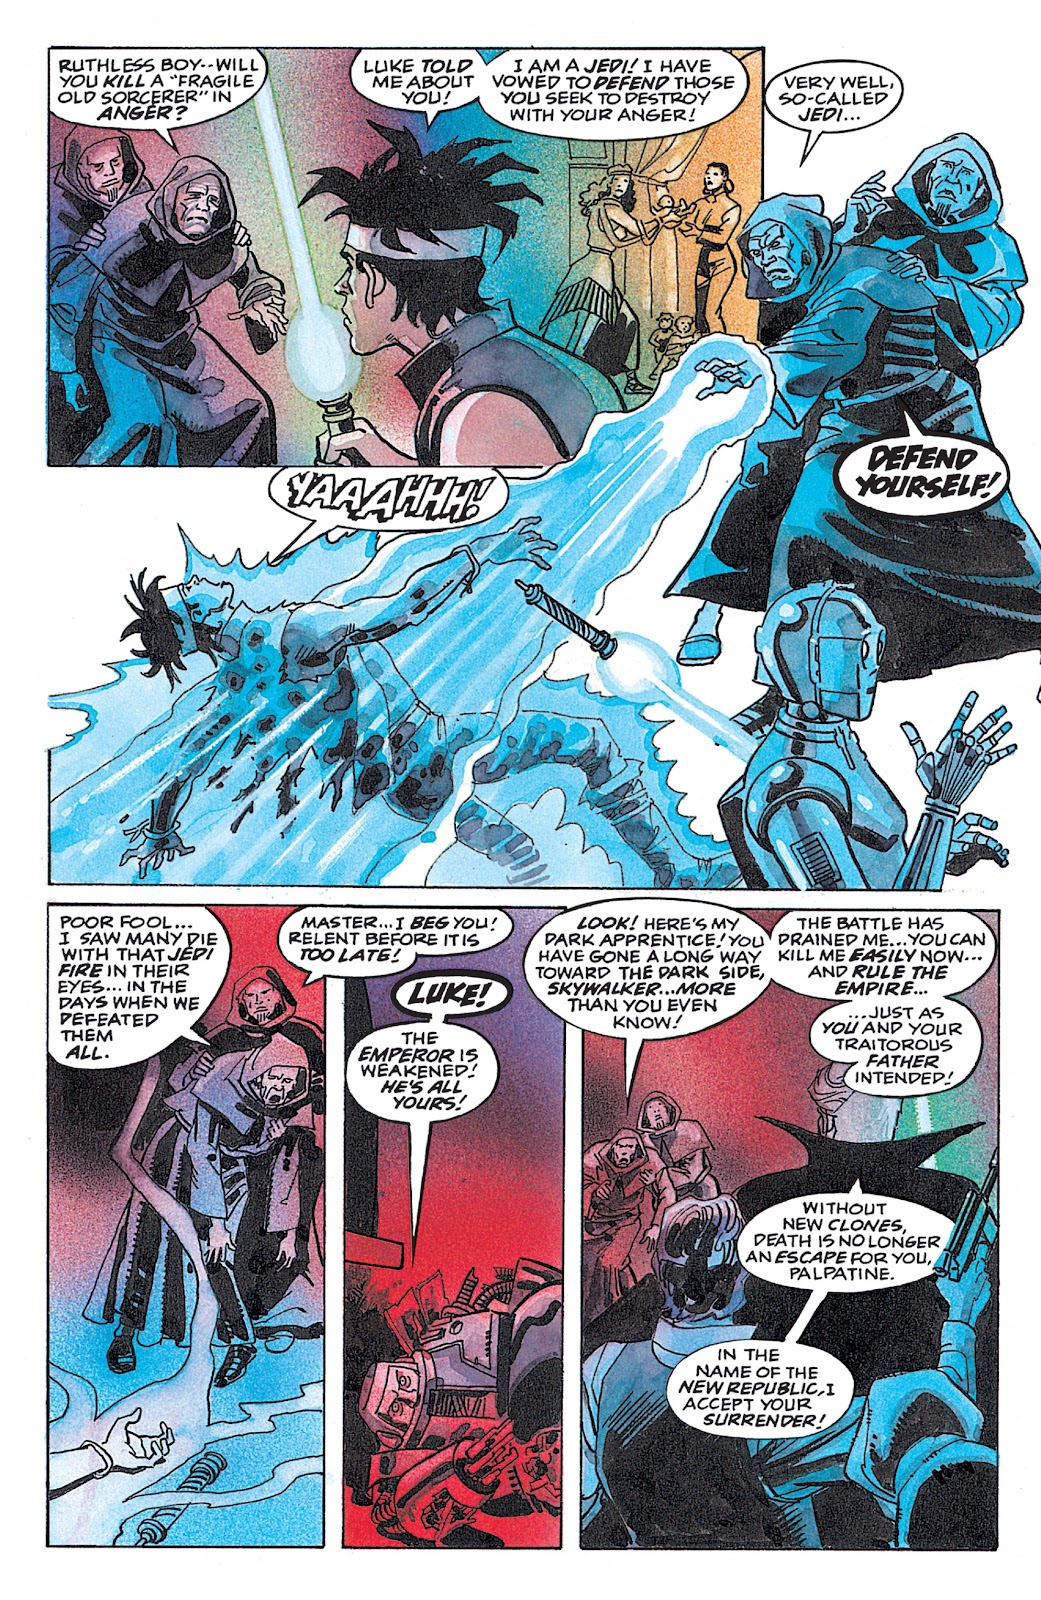 Read online Star Wars: Dark Empire Trilogy comic -  Issue # TPB (Part 4) - 50